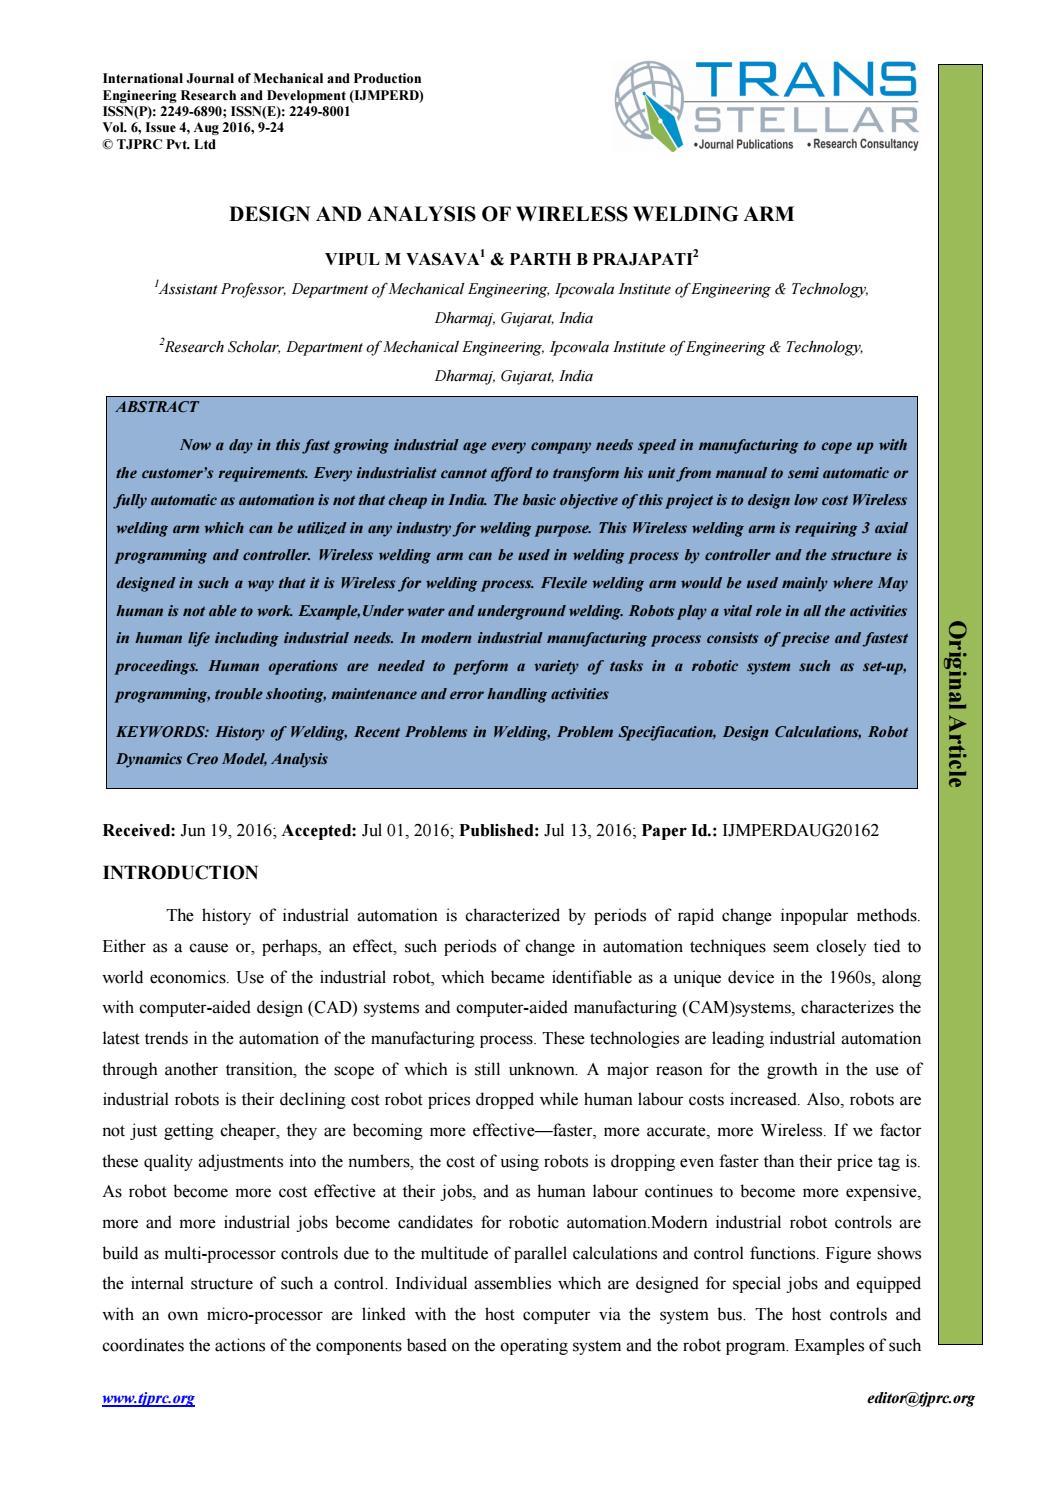 2 ijmperd design and analysis of wireless welding arm by